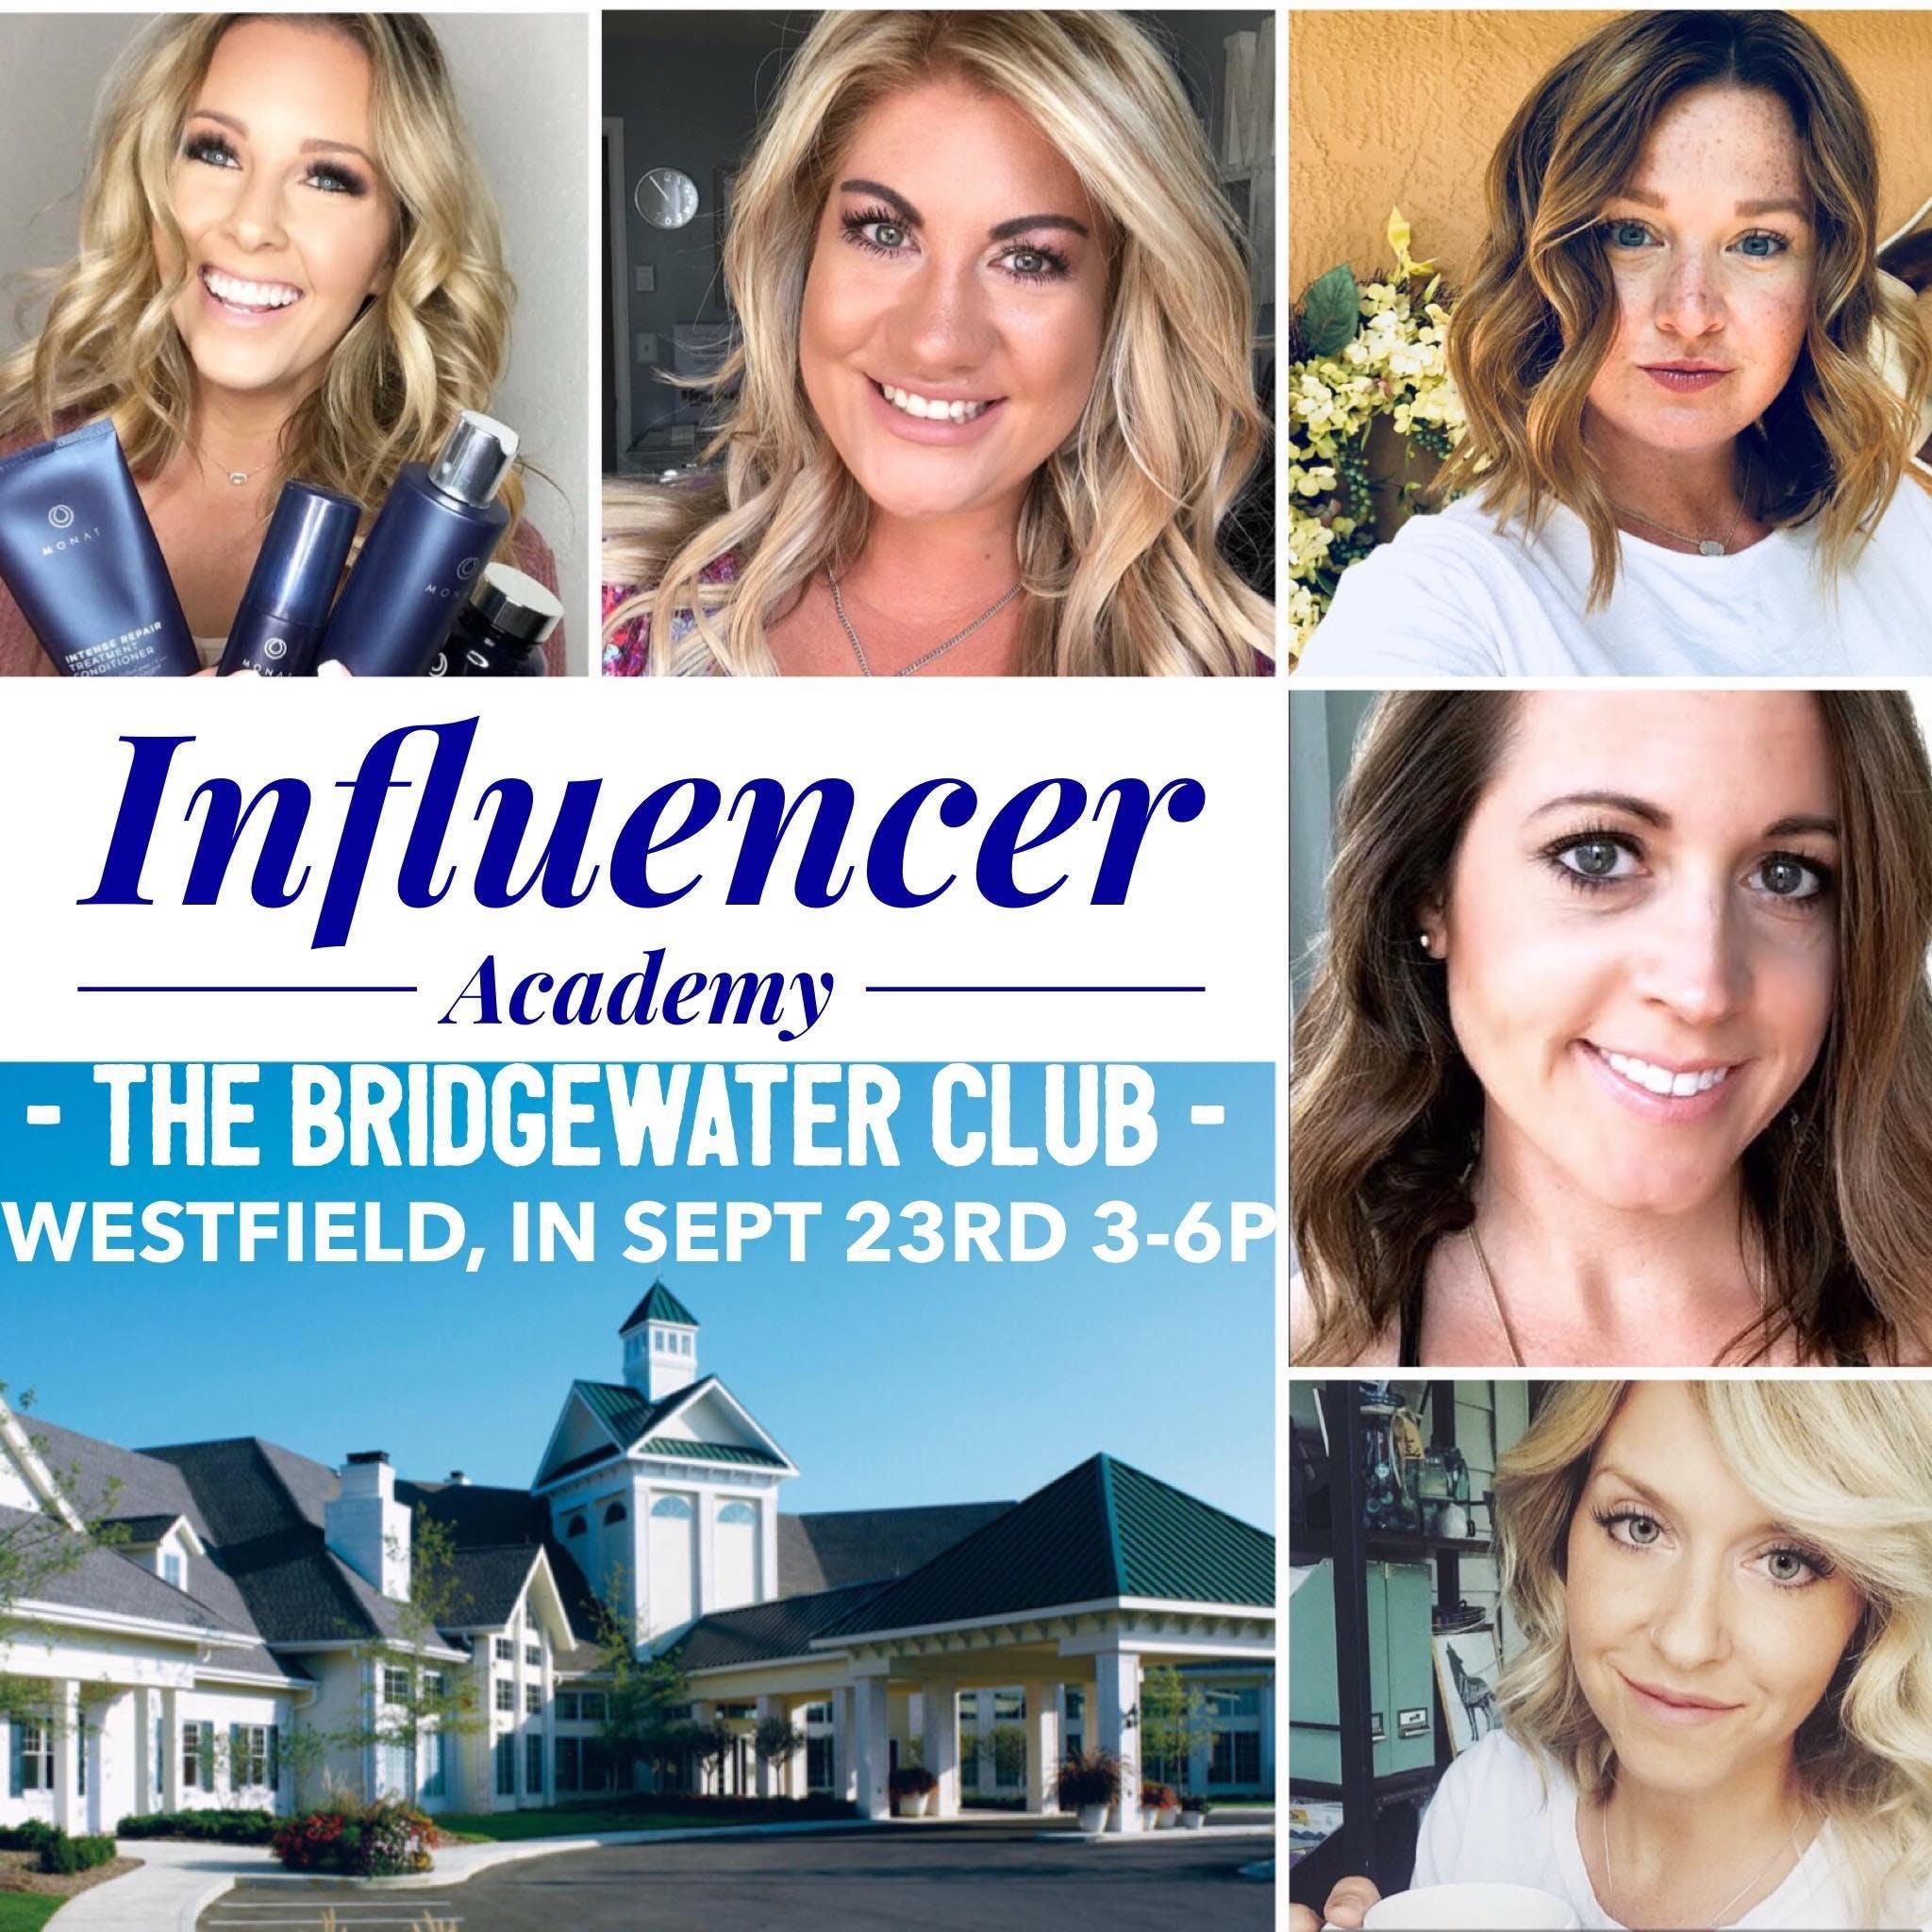 Influencer Academy